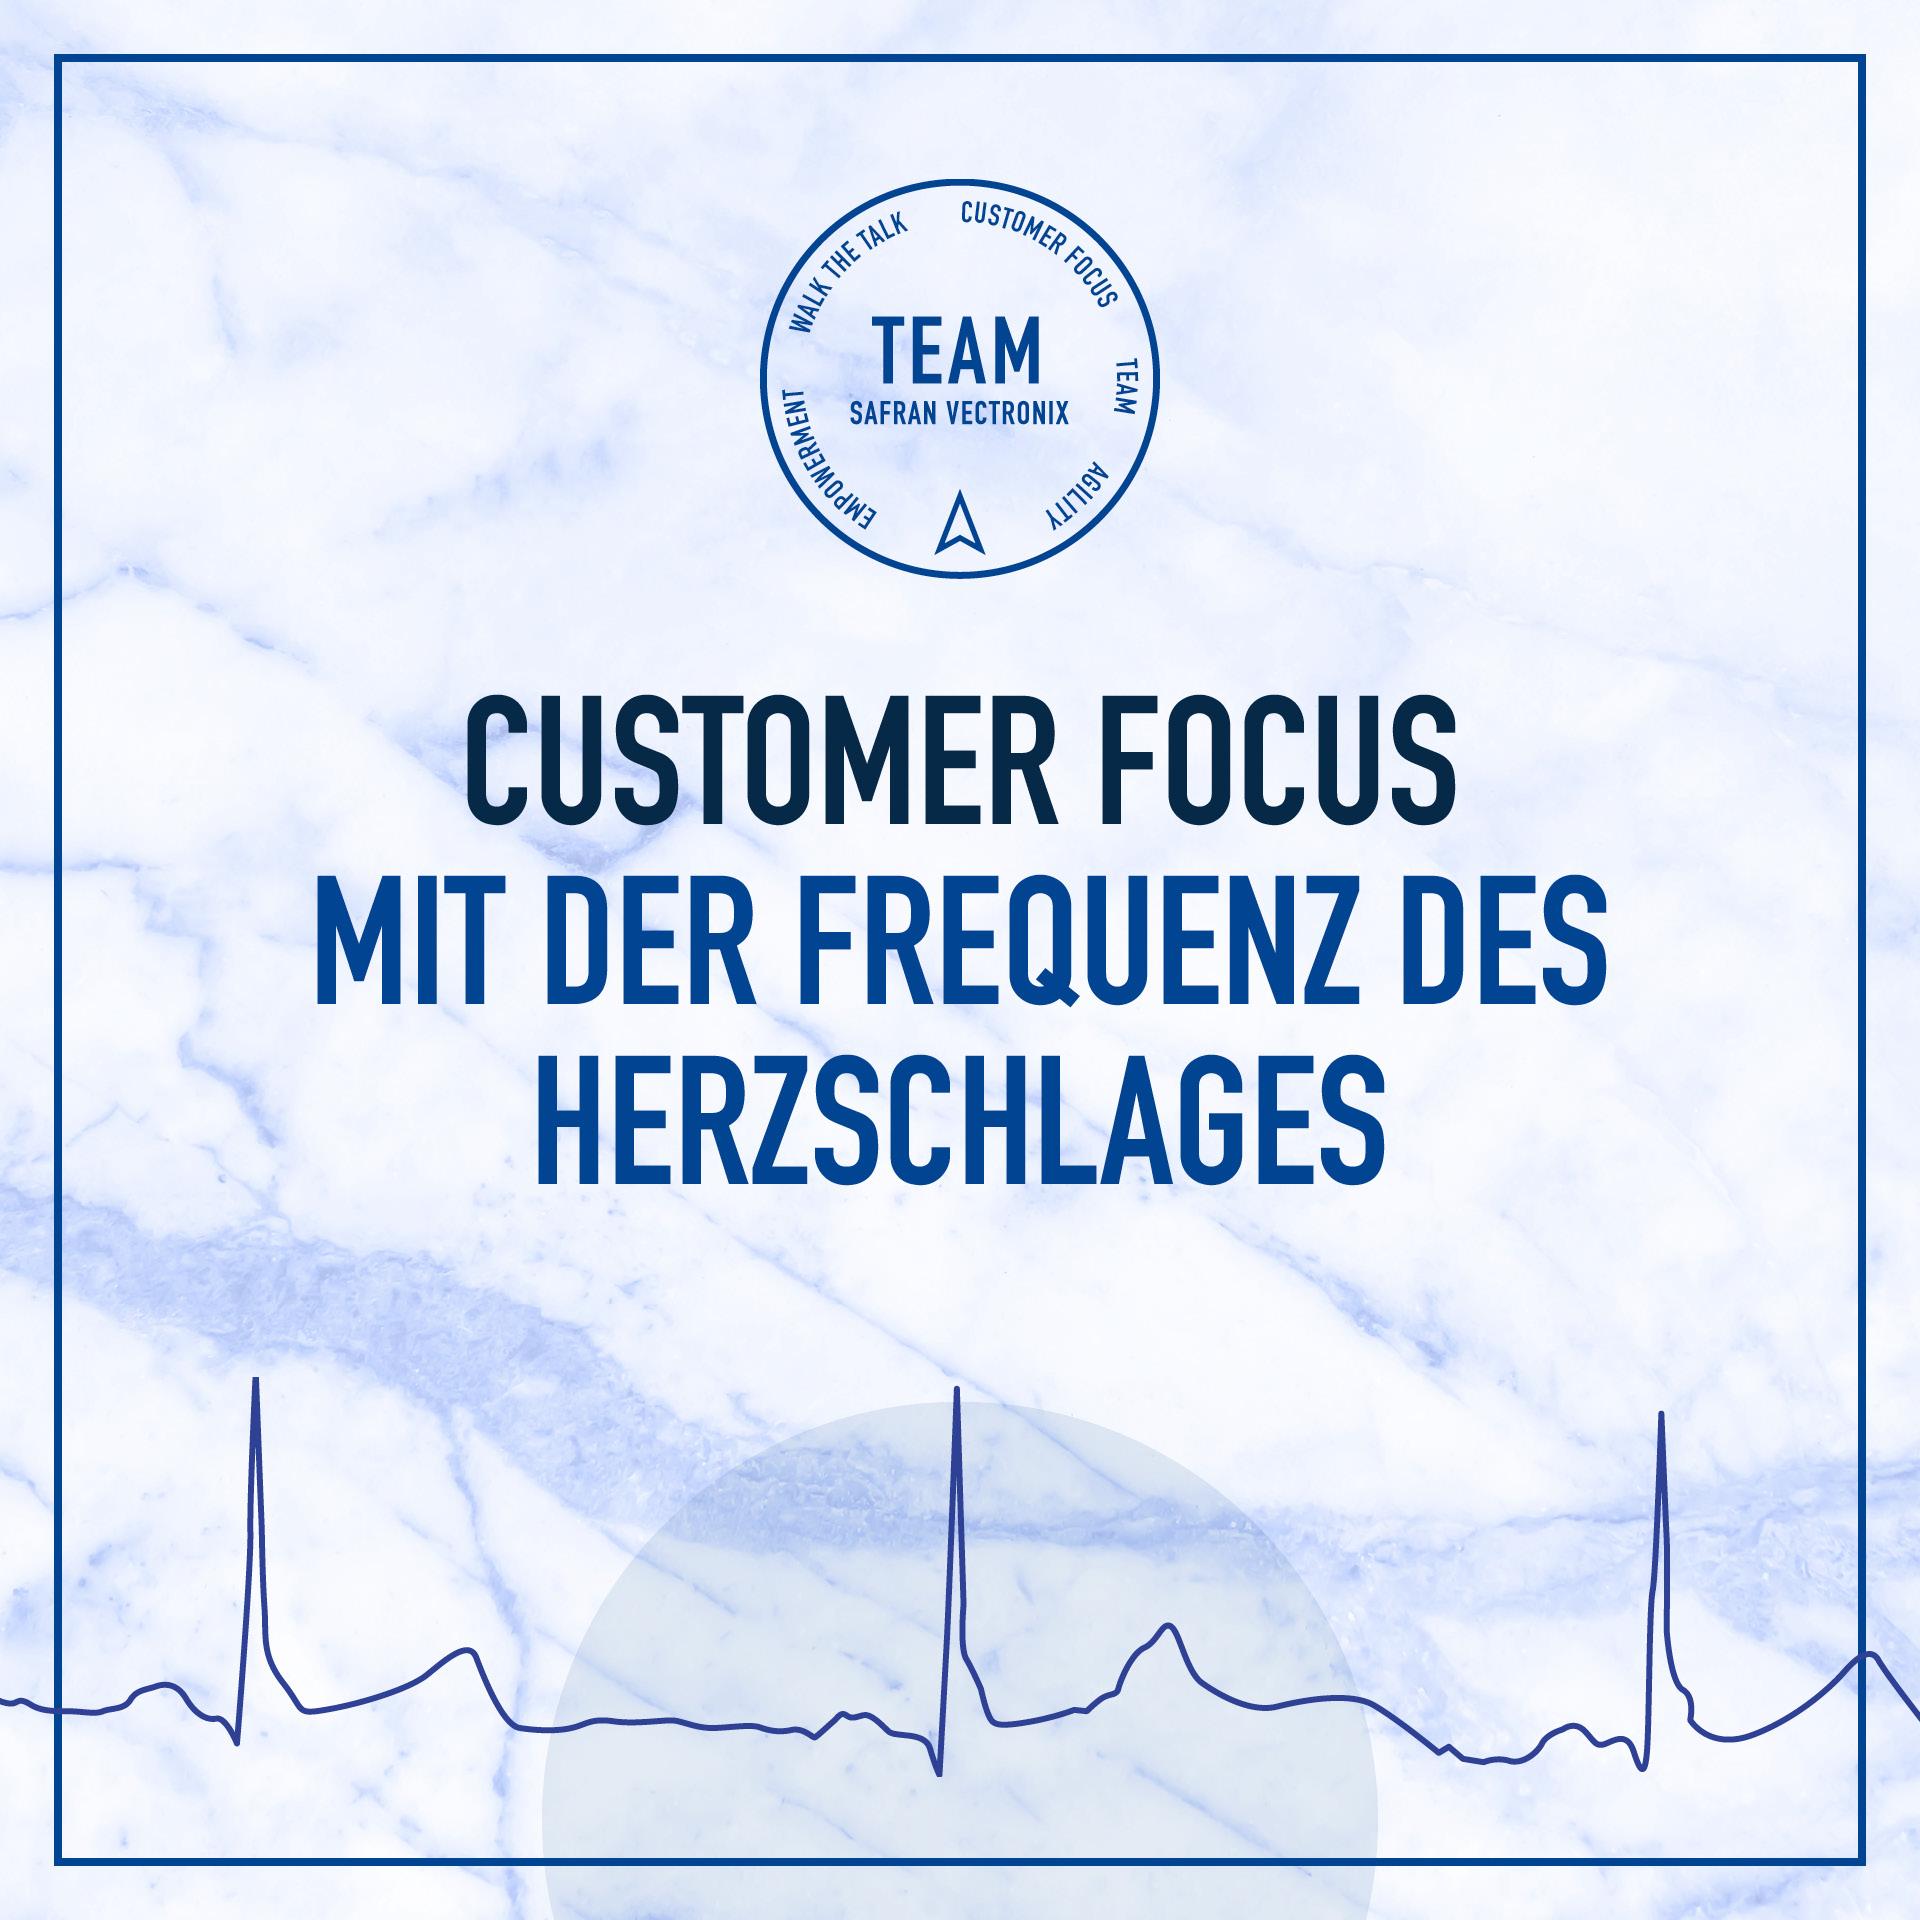 safran vectronix values customer focus